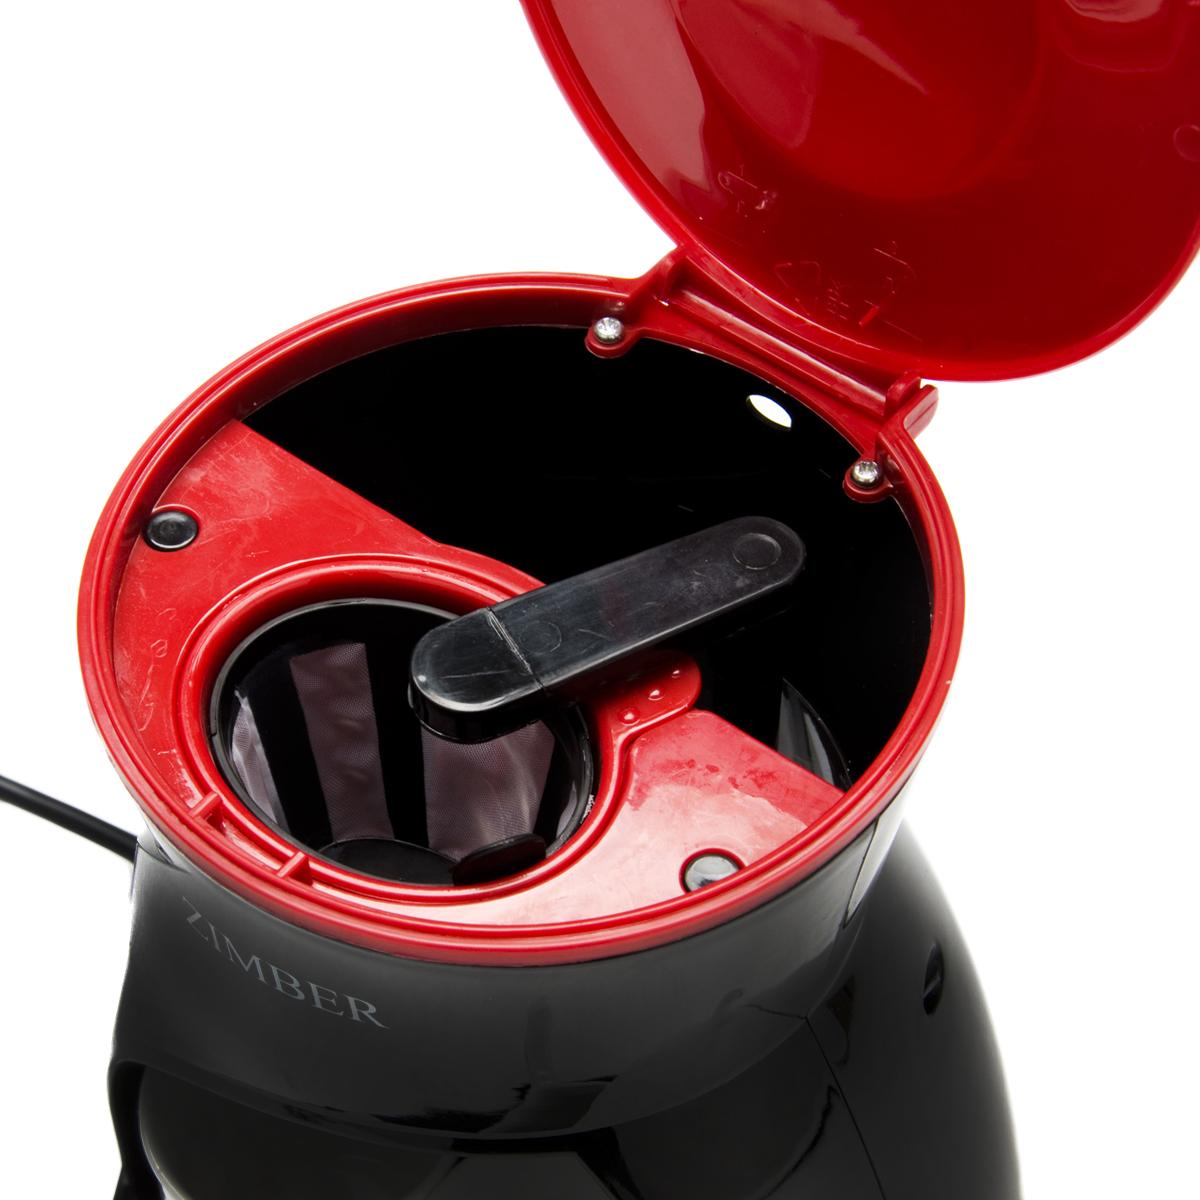 Zimber ZM-10982 кофеварка